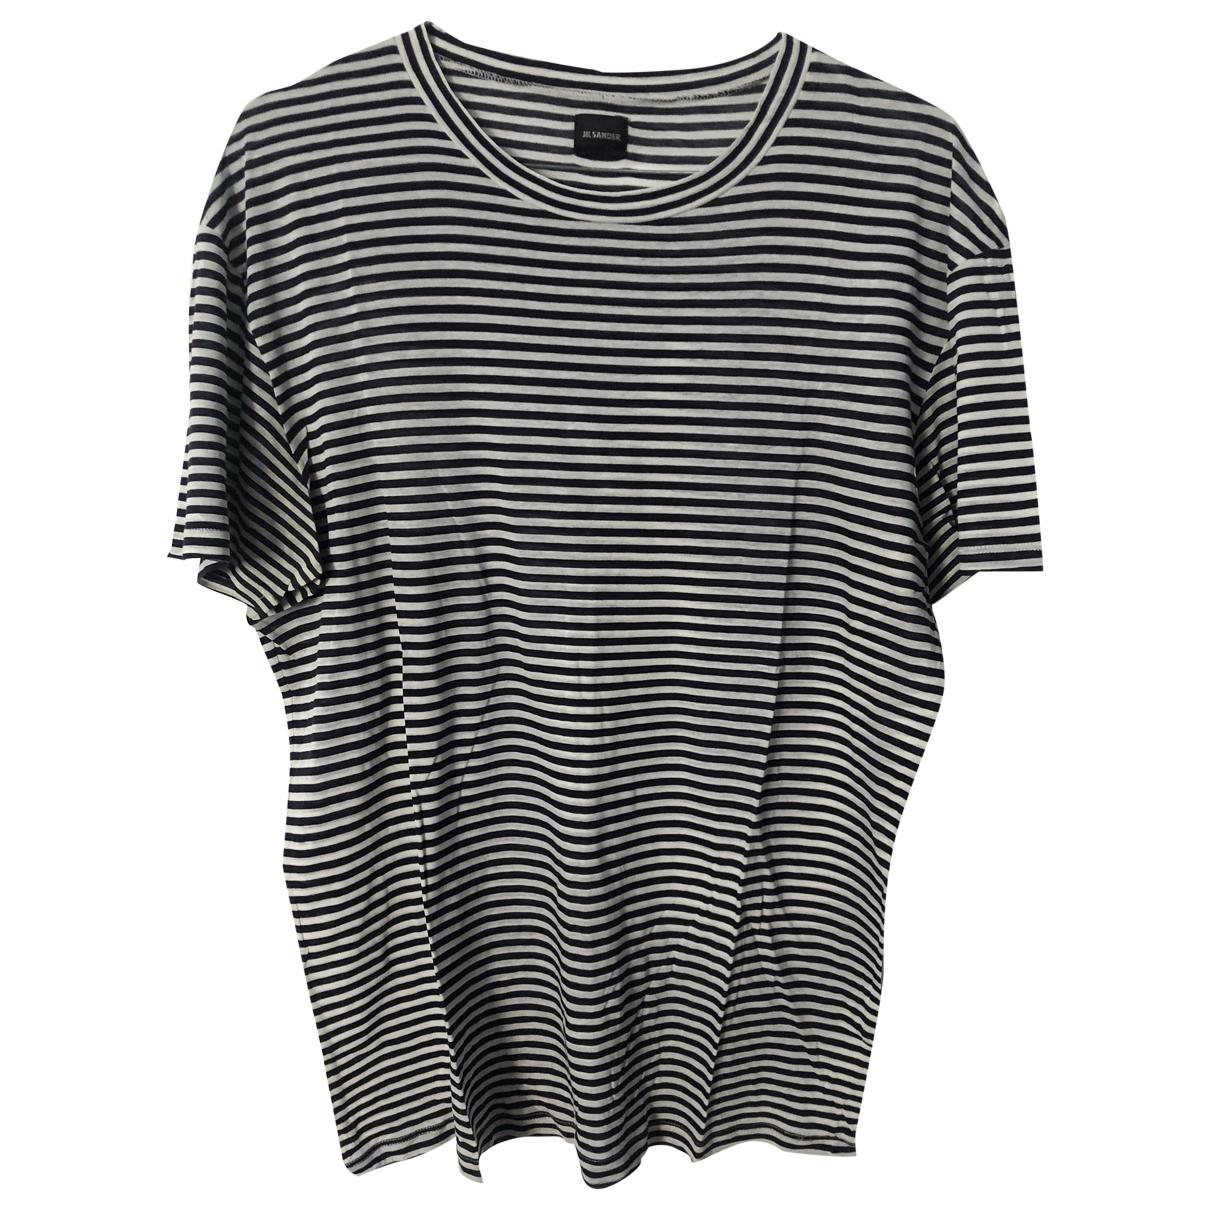 Jil Sander \N T-Shirts in  Schwarz Baumwolle